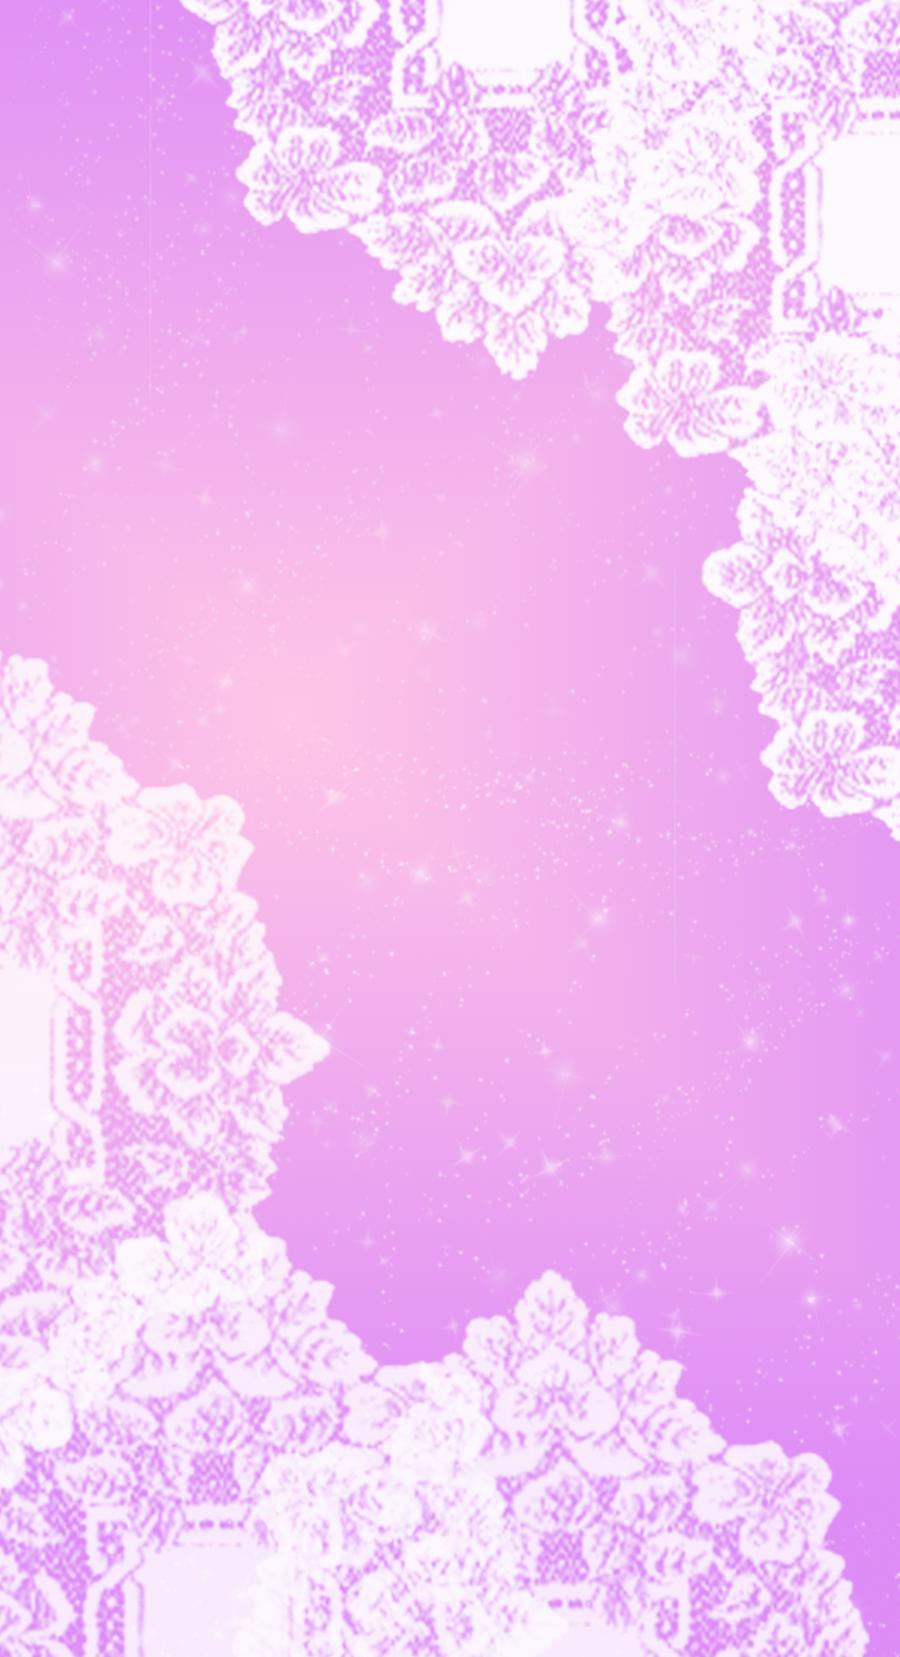 Pin Light-pink-background-tumblr on Pinterest